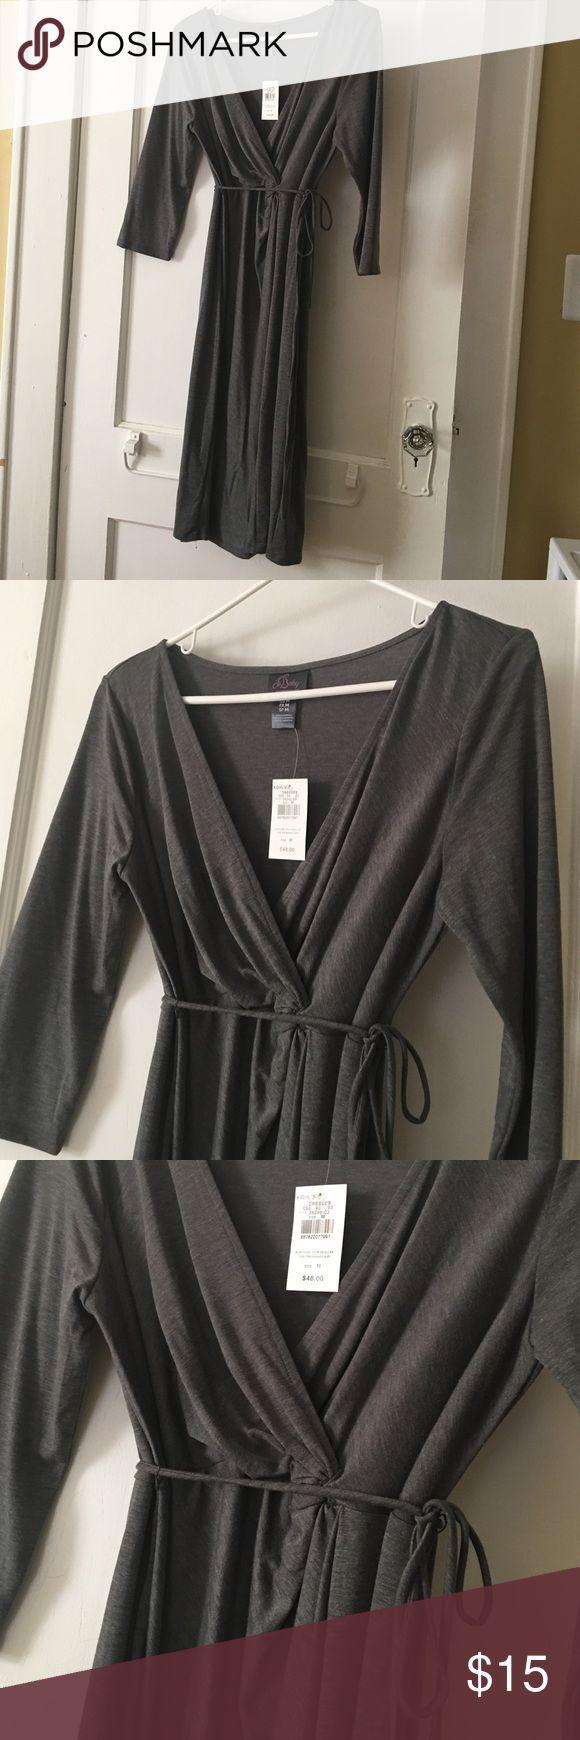 Maternity dress - long sleeve grey dress Never been worn- Maternity dress - long sleeve grey dress Dresses